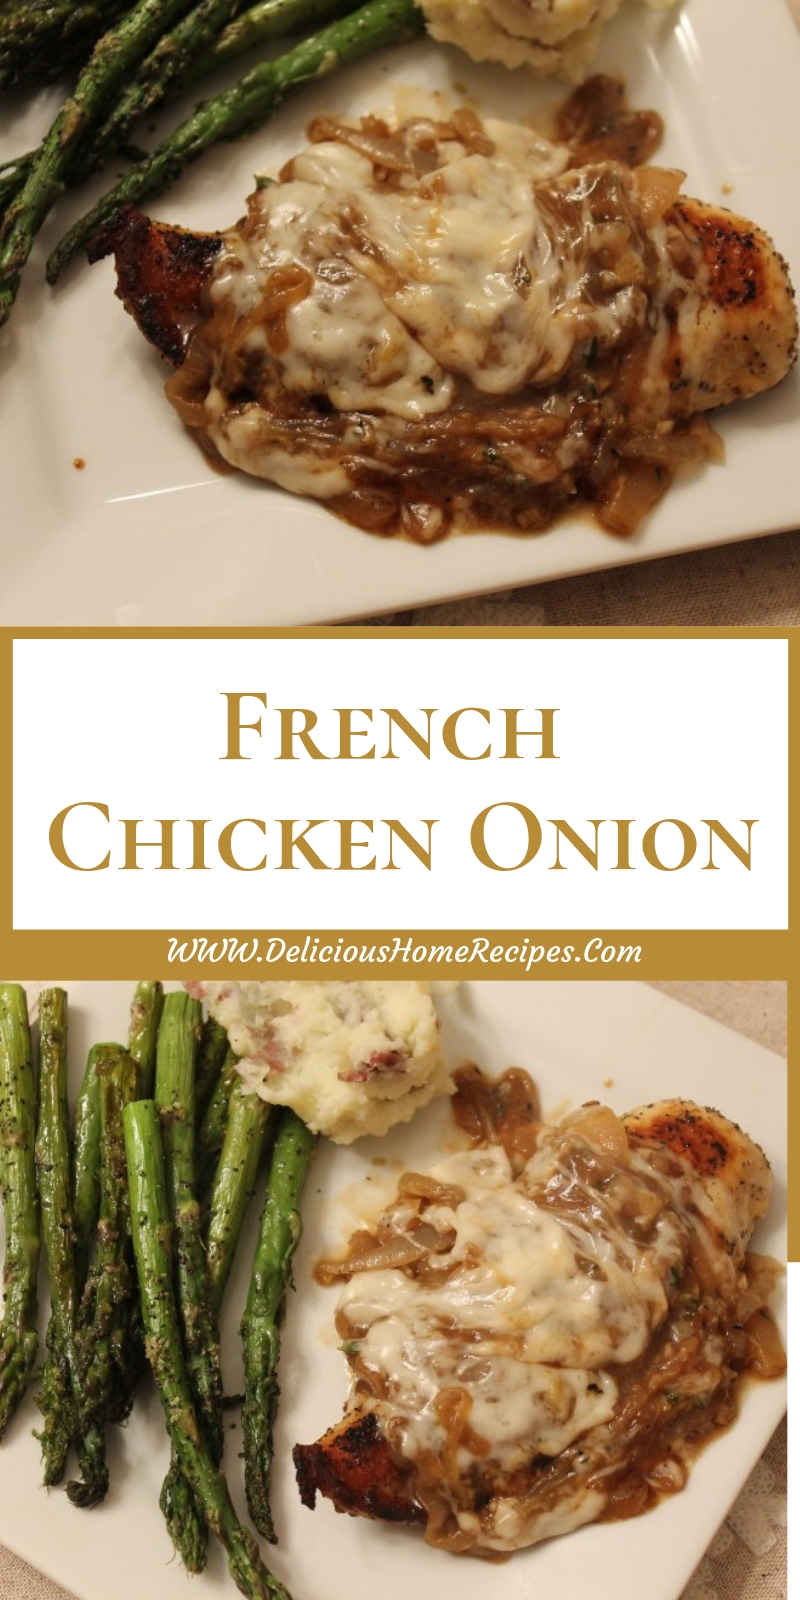 French Chicken Onion